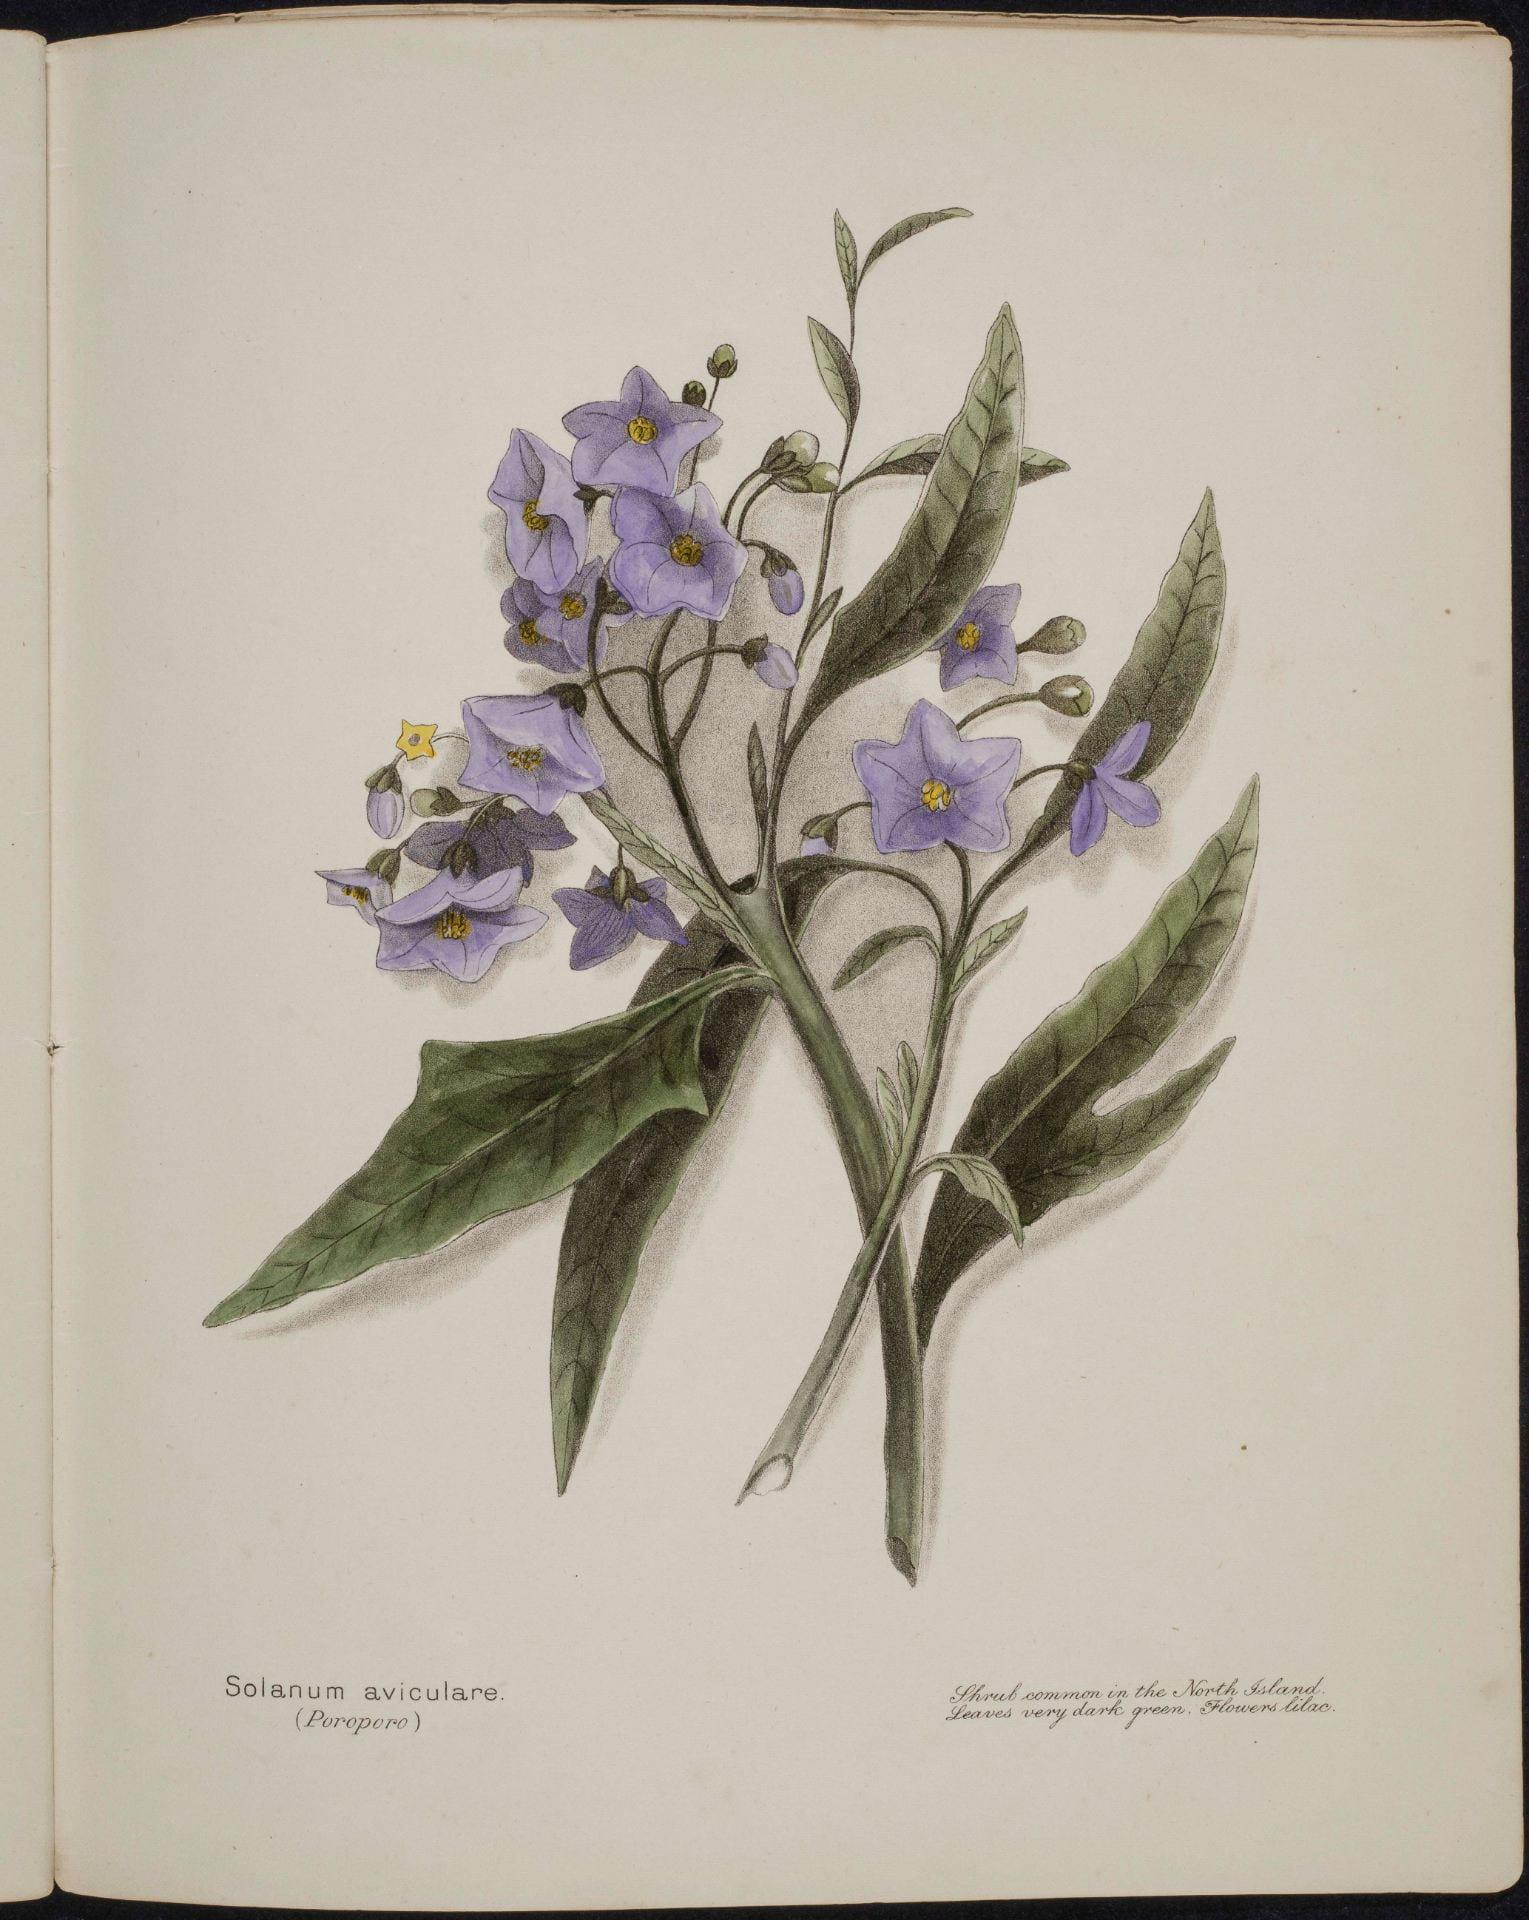 Solanum aviculare Poroporo